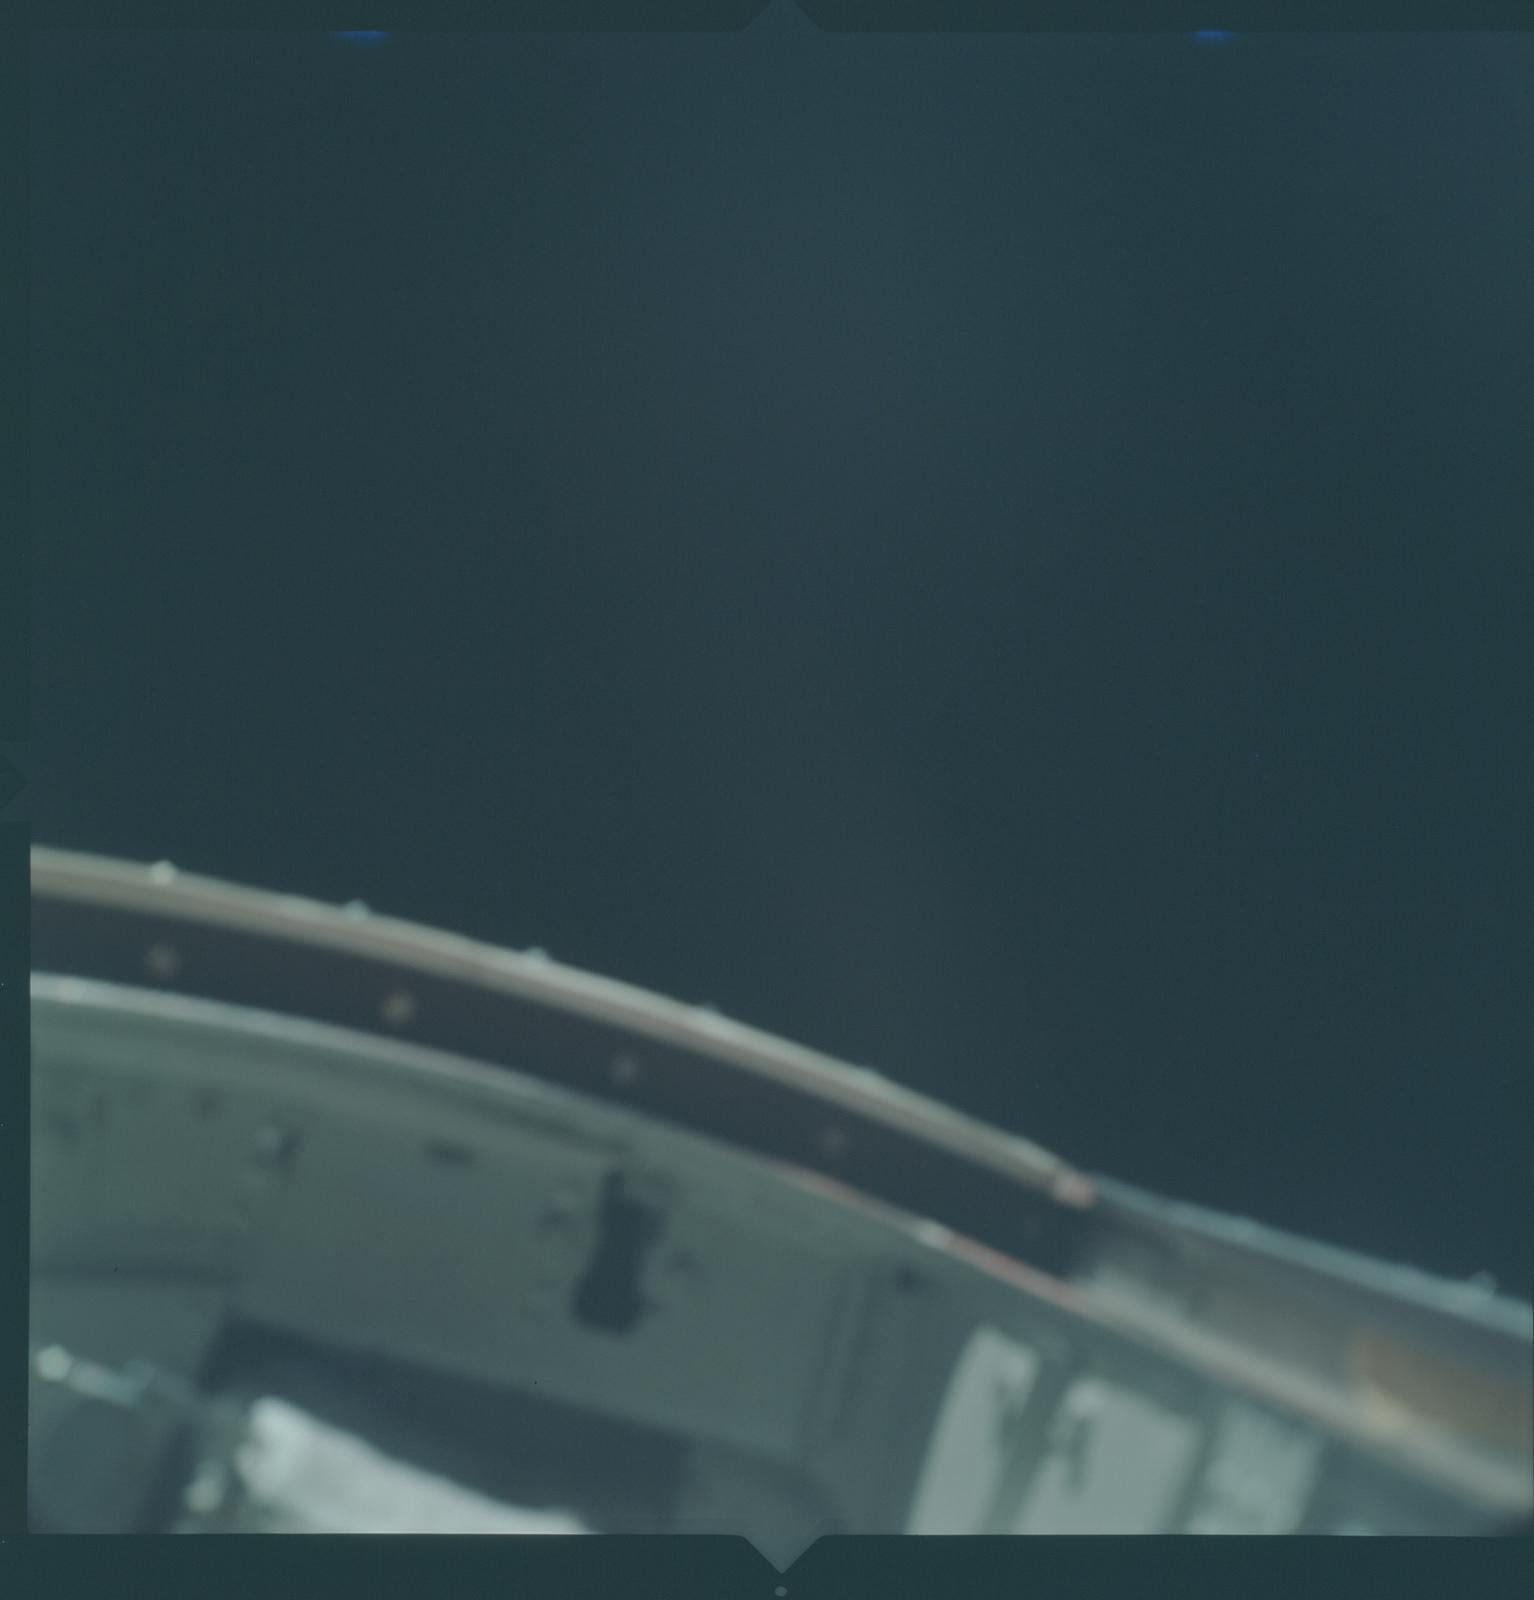 Gemini X Mission Image - Open Hatch